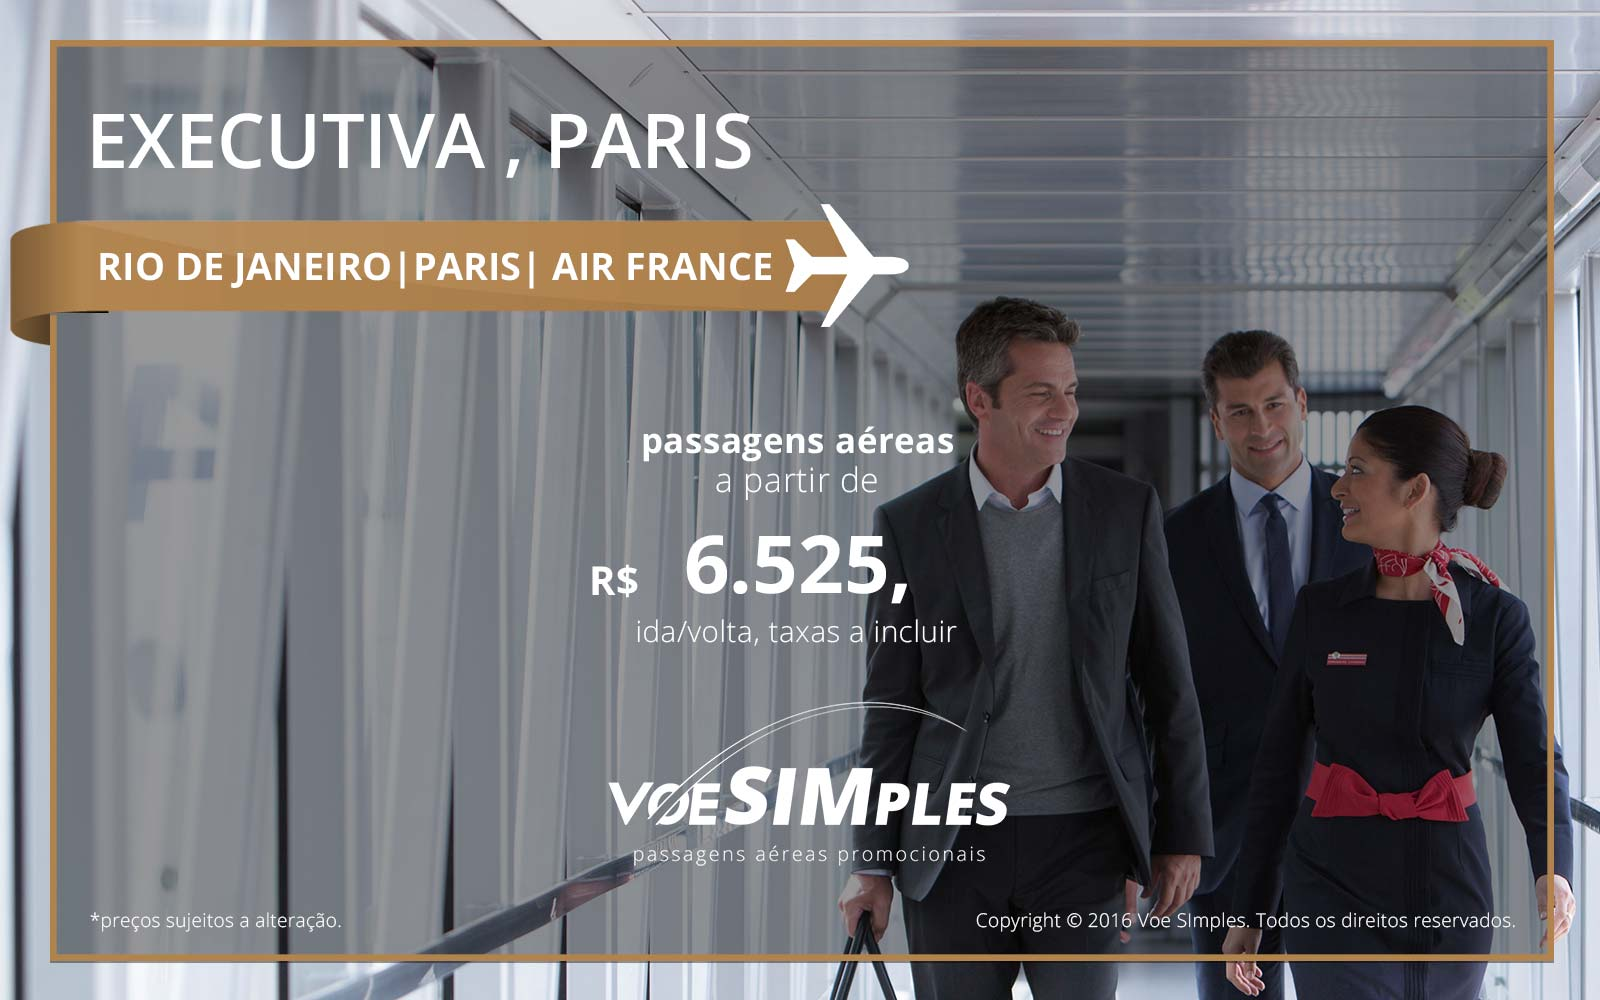 Passagem aérea Classe Executiva Air France para Paris